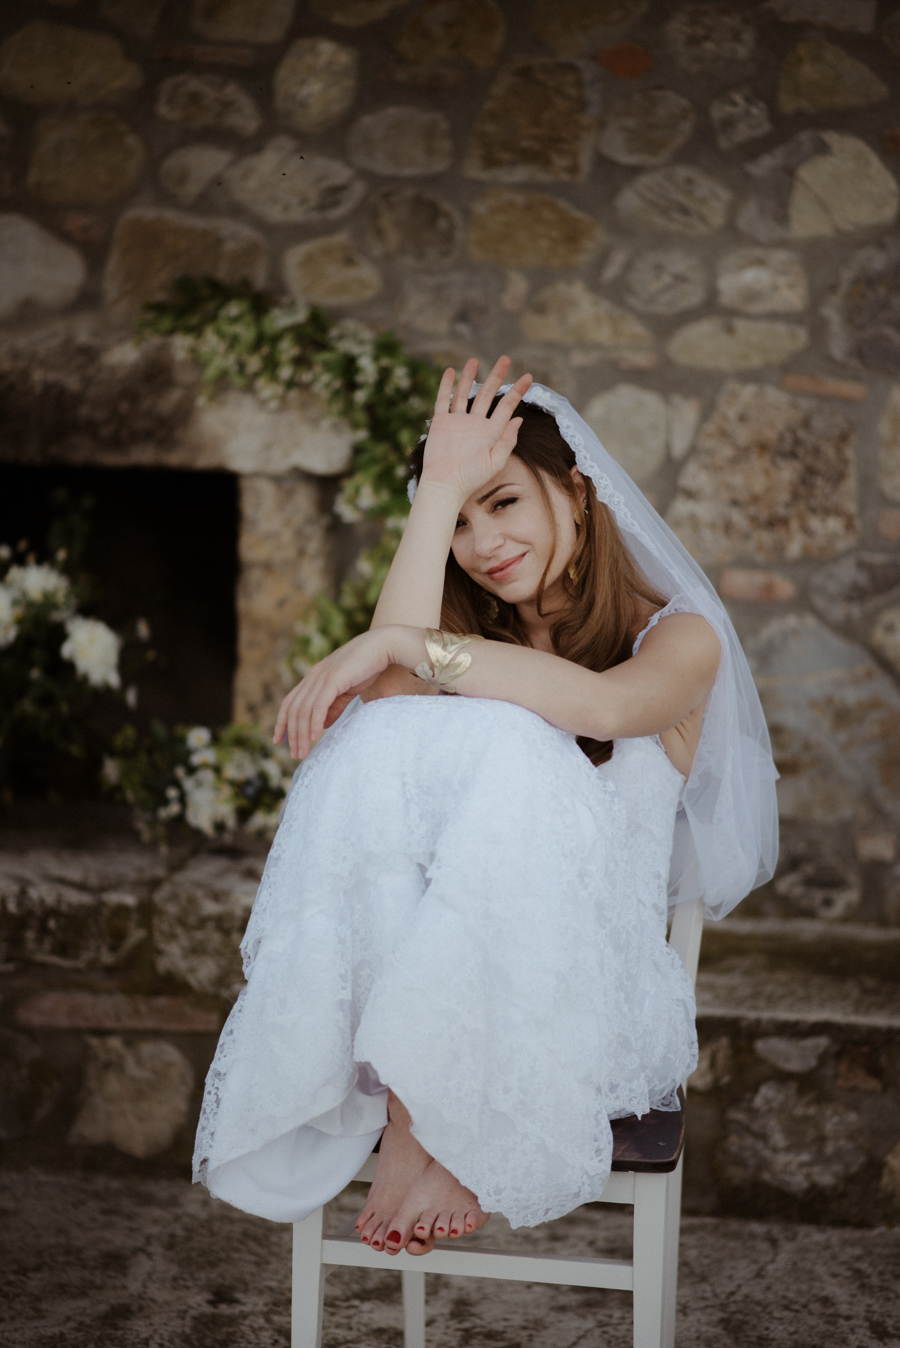 matrimonio-anni-70-sarinski-bianco-photography-12